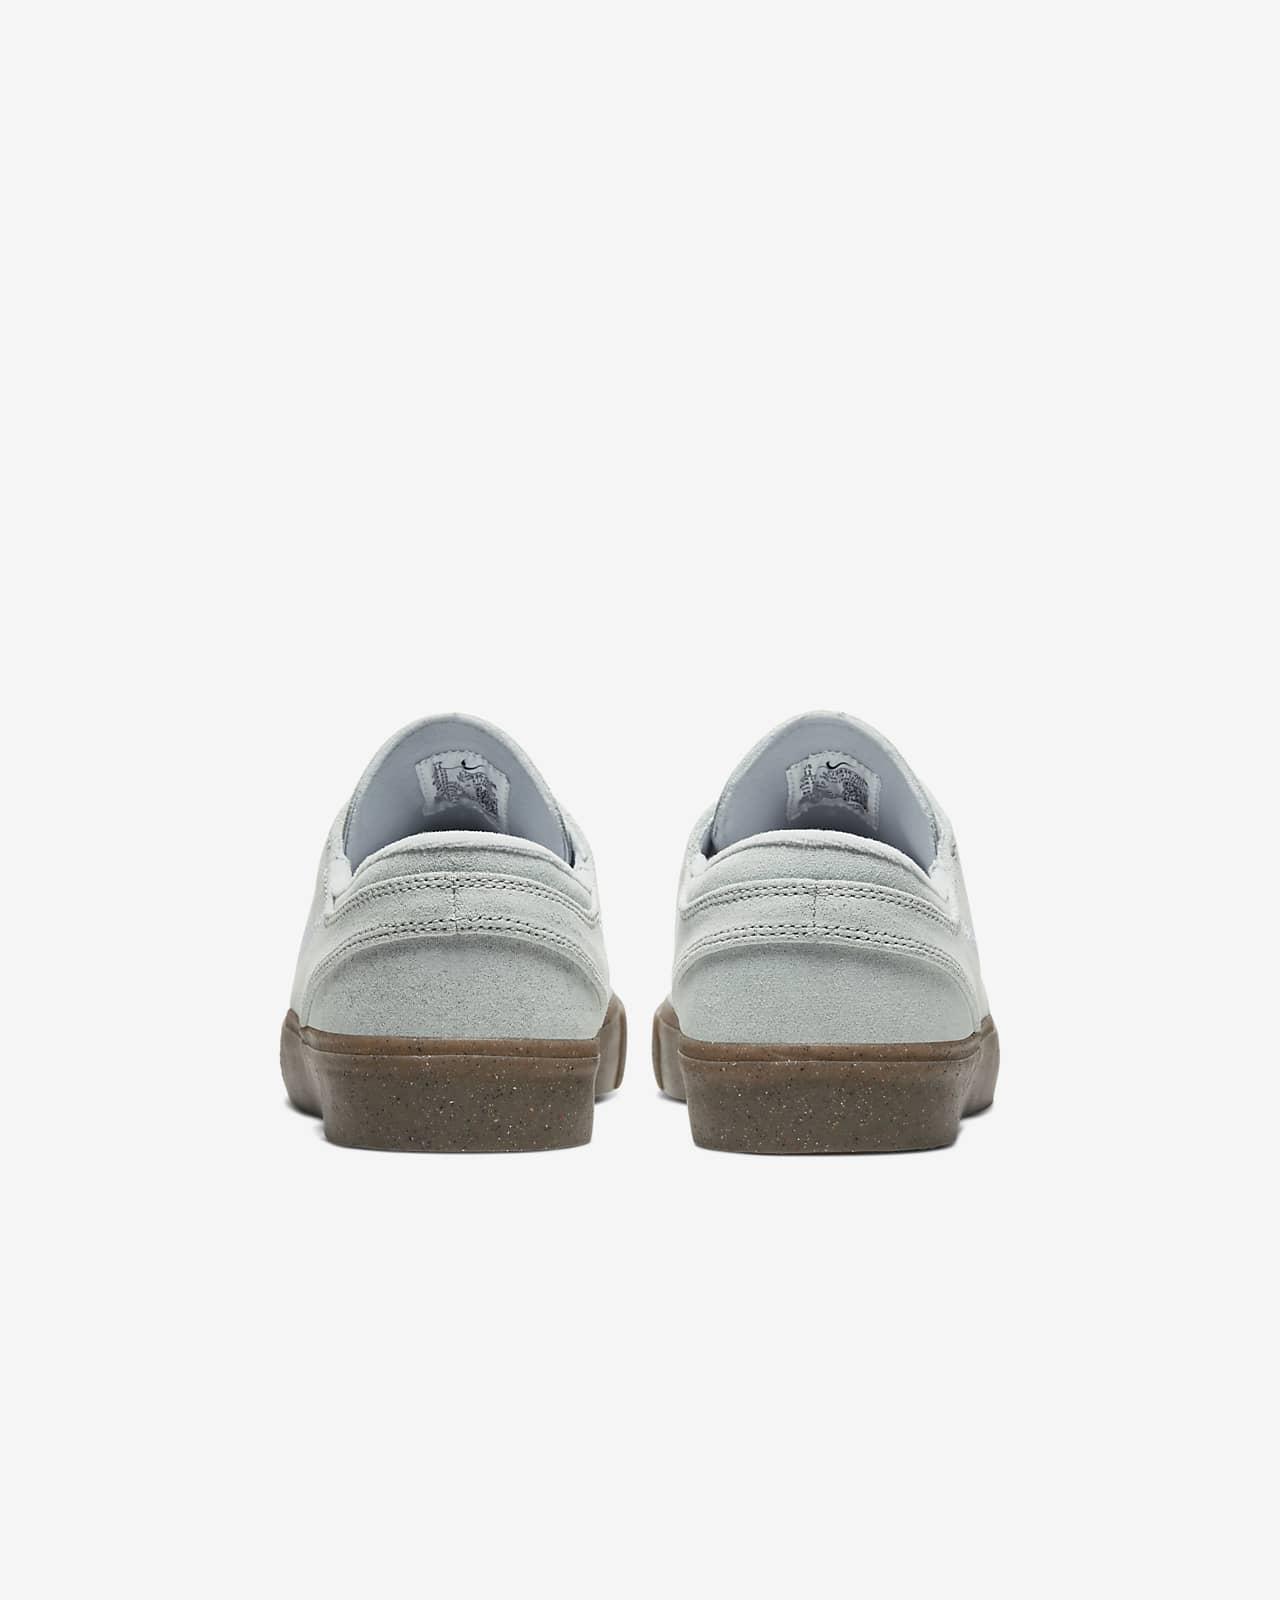 shoes nike janoski